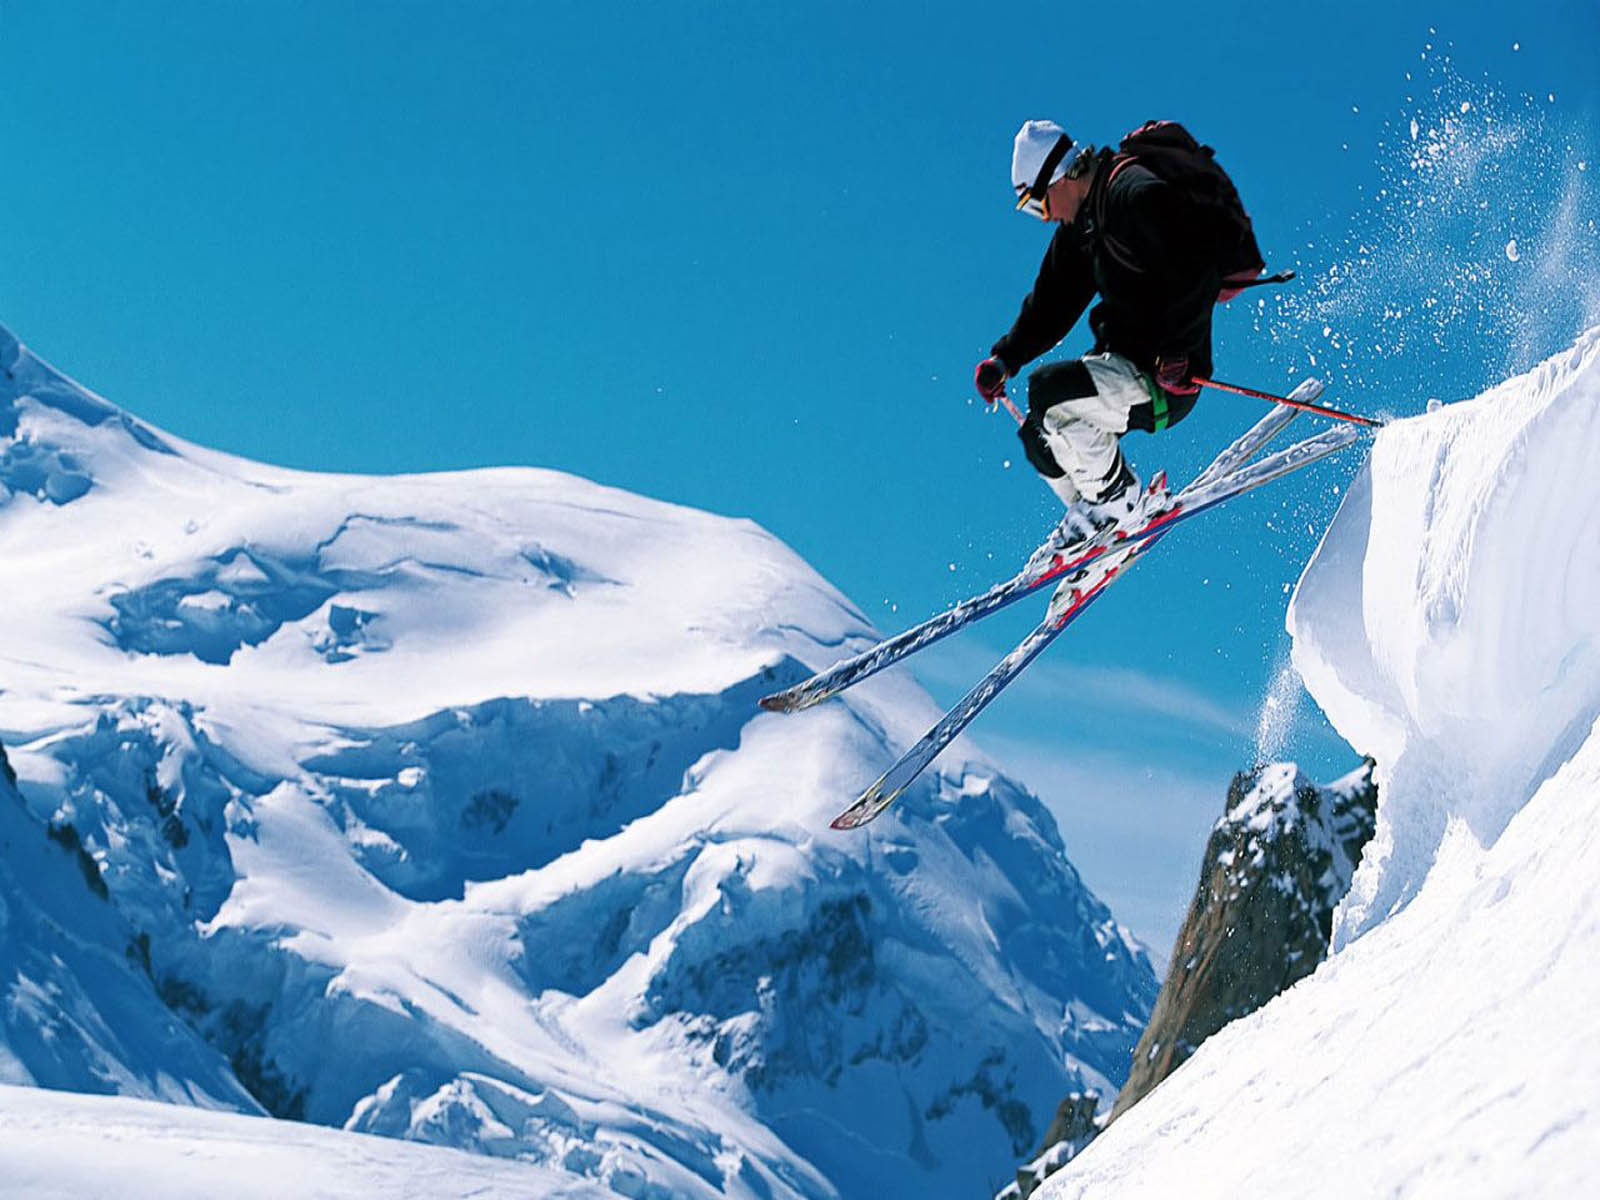 Wallpapers free skiing - Ski wallpaper ...